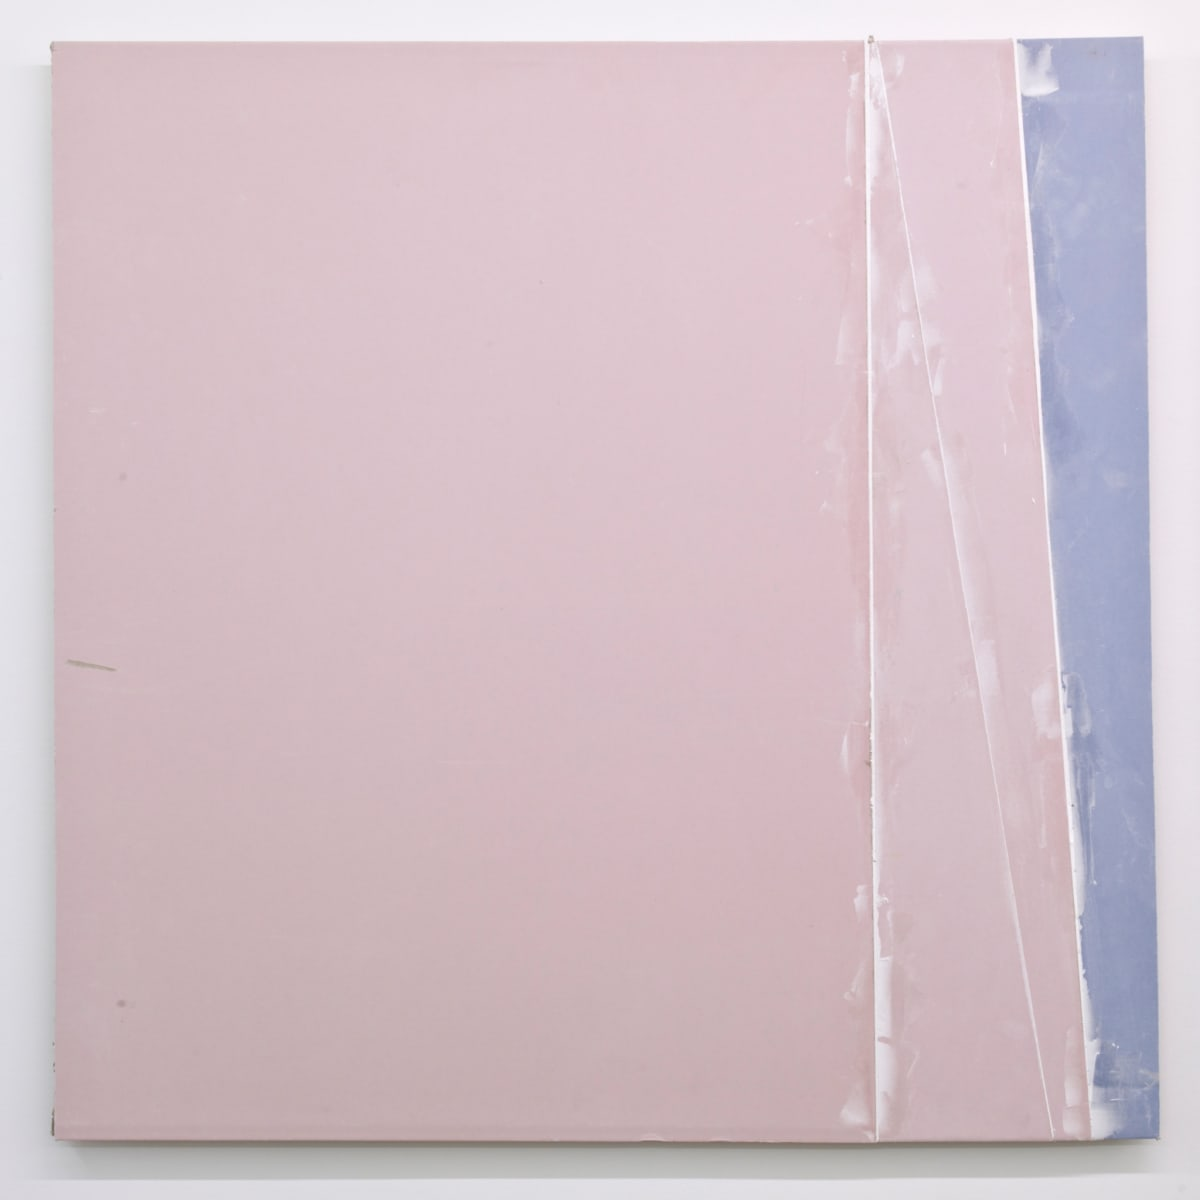 Paul Merrick, Untitled, 2014